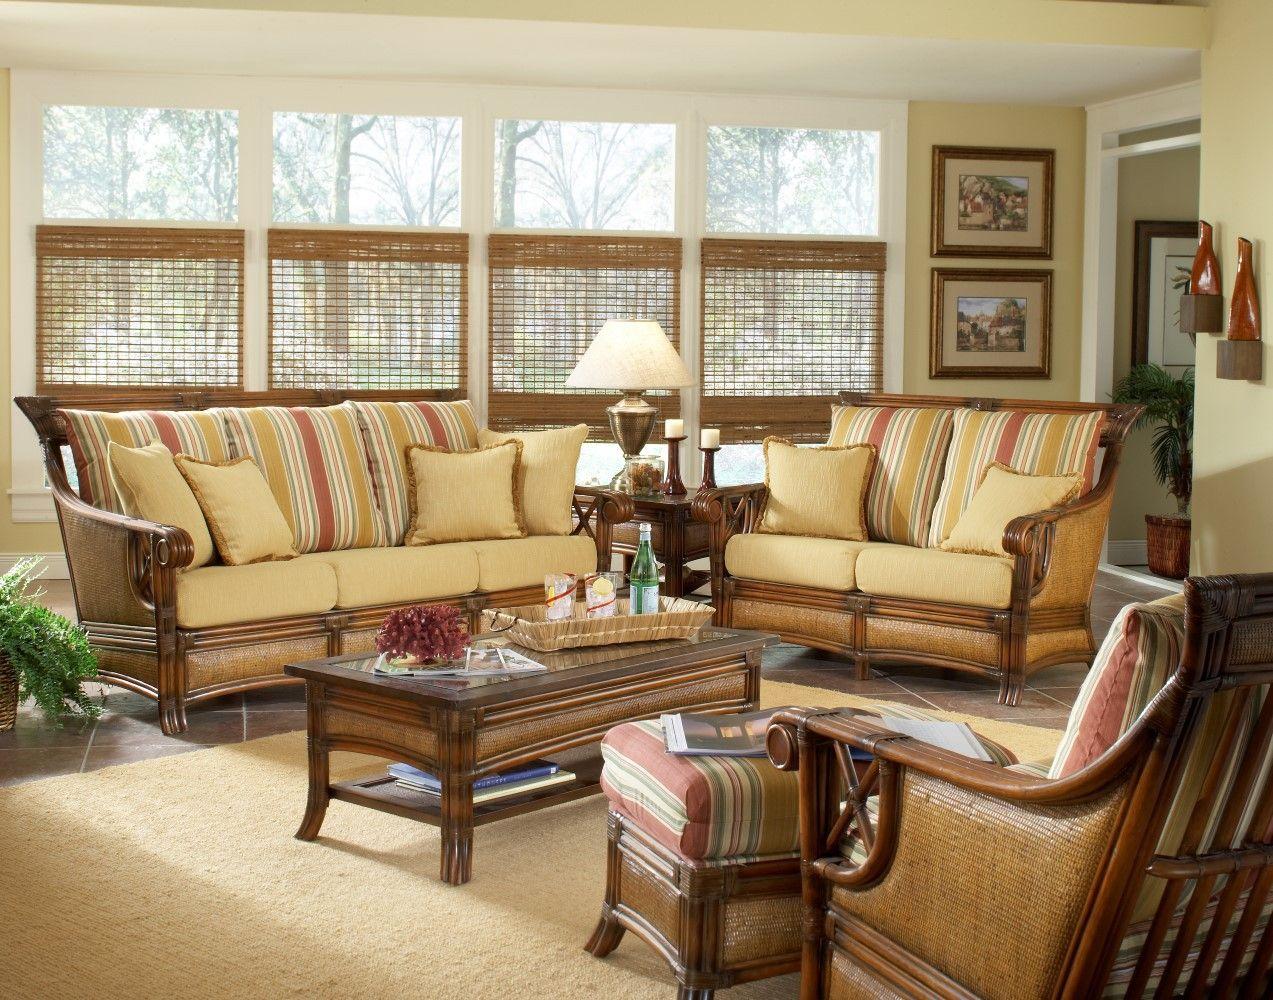 Modern Wicker South Sea Rattan Pacifica Indoor Living Room Set 4 608 00 Http